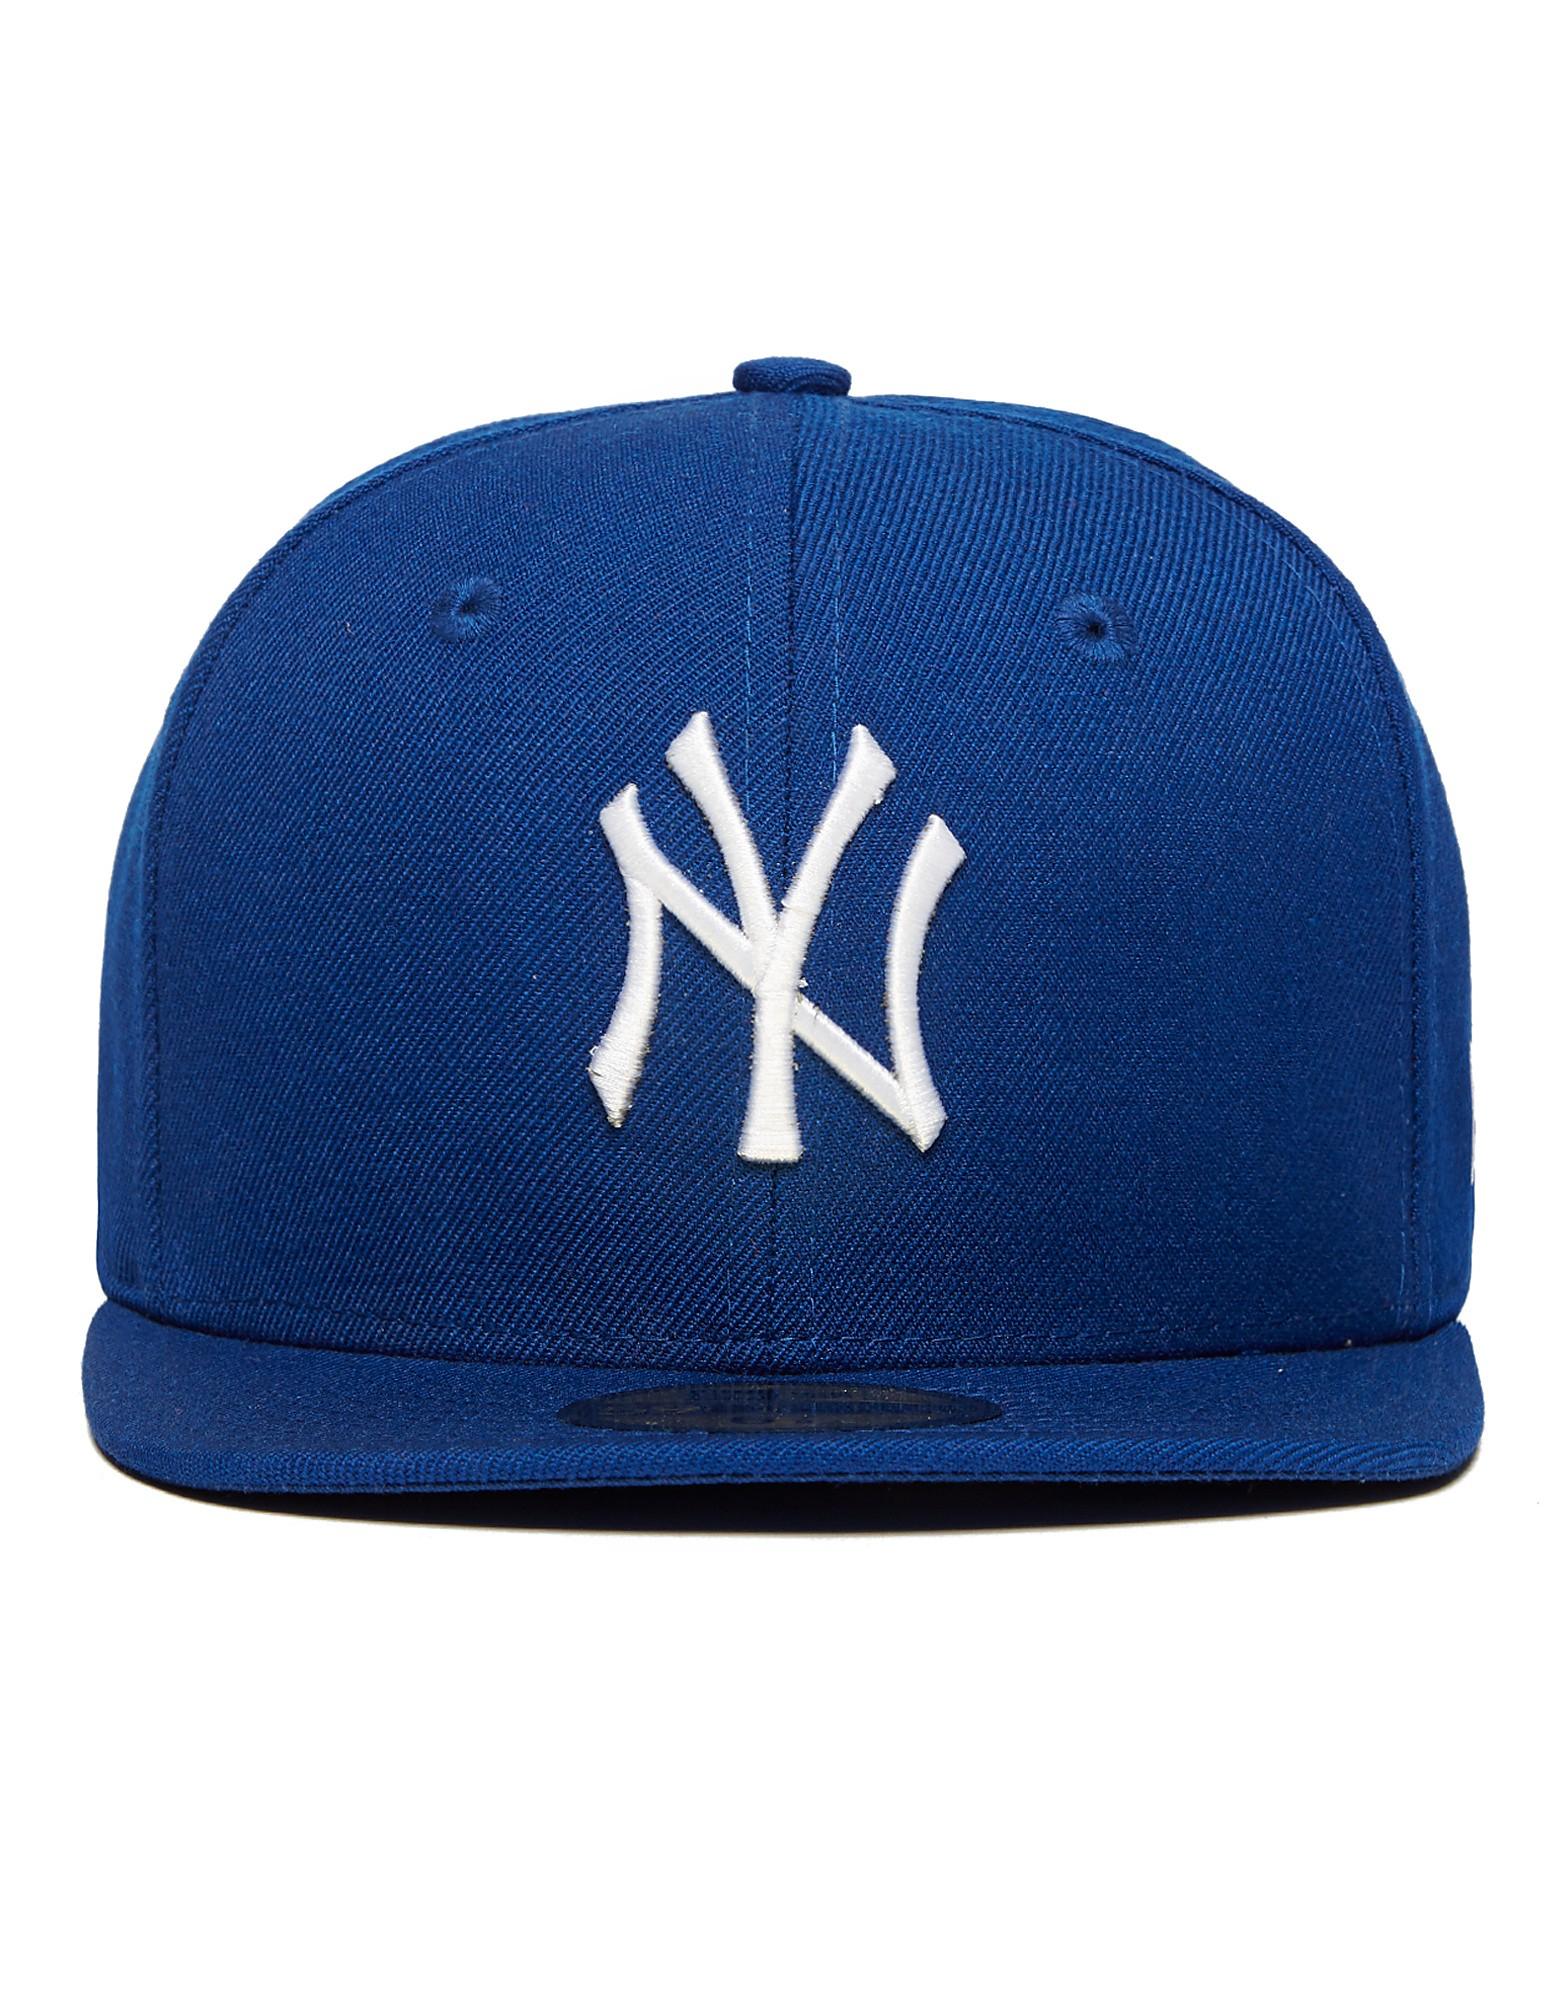 New Era MLB New York Yankees 59FIFTY – tilpasset kasket